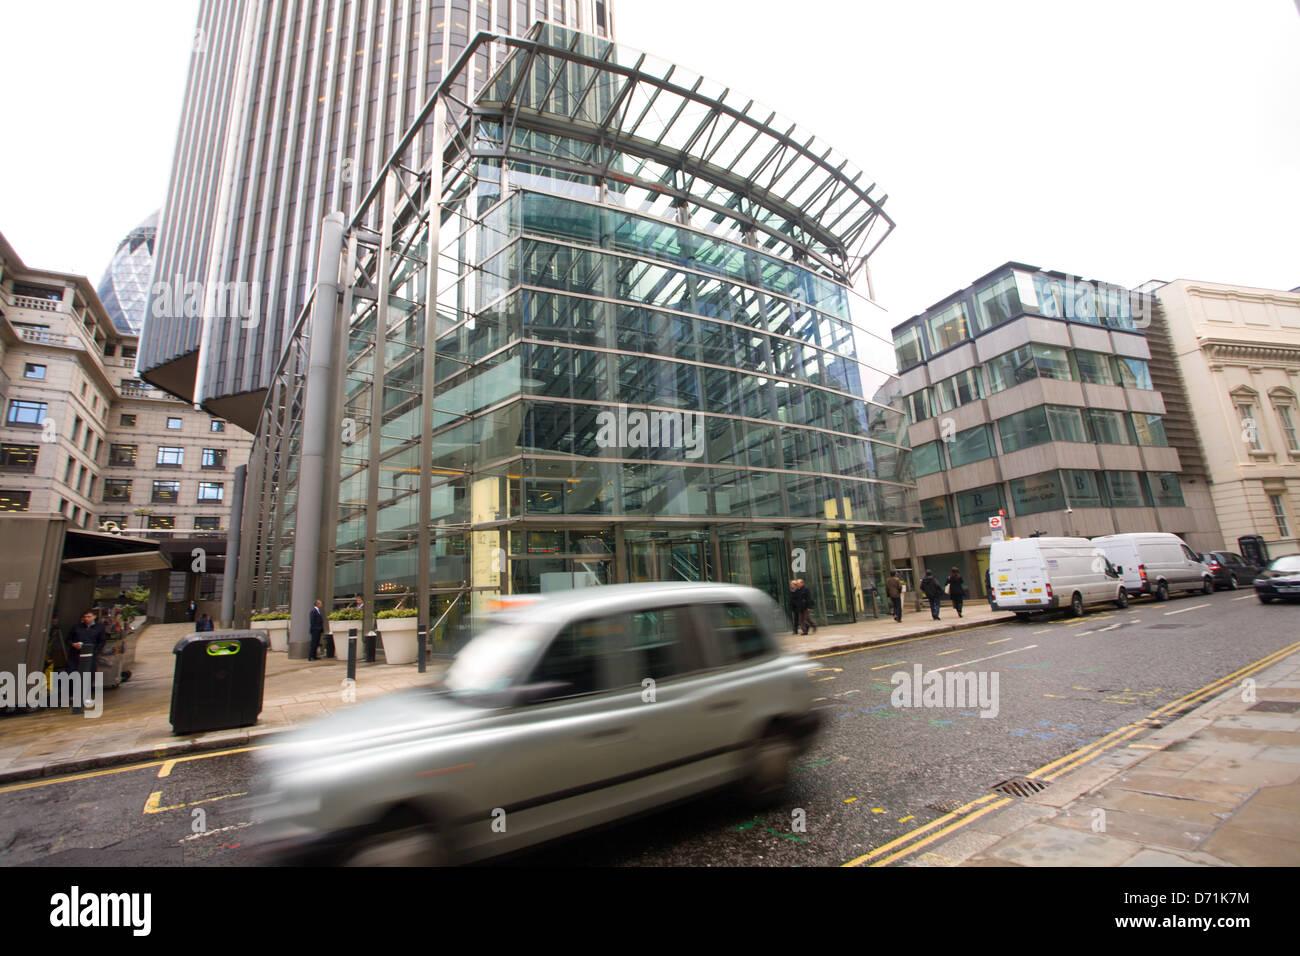 Eingang zum Tower 42, Old broad Street, London Stockbild